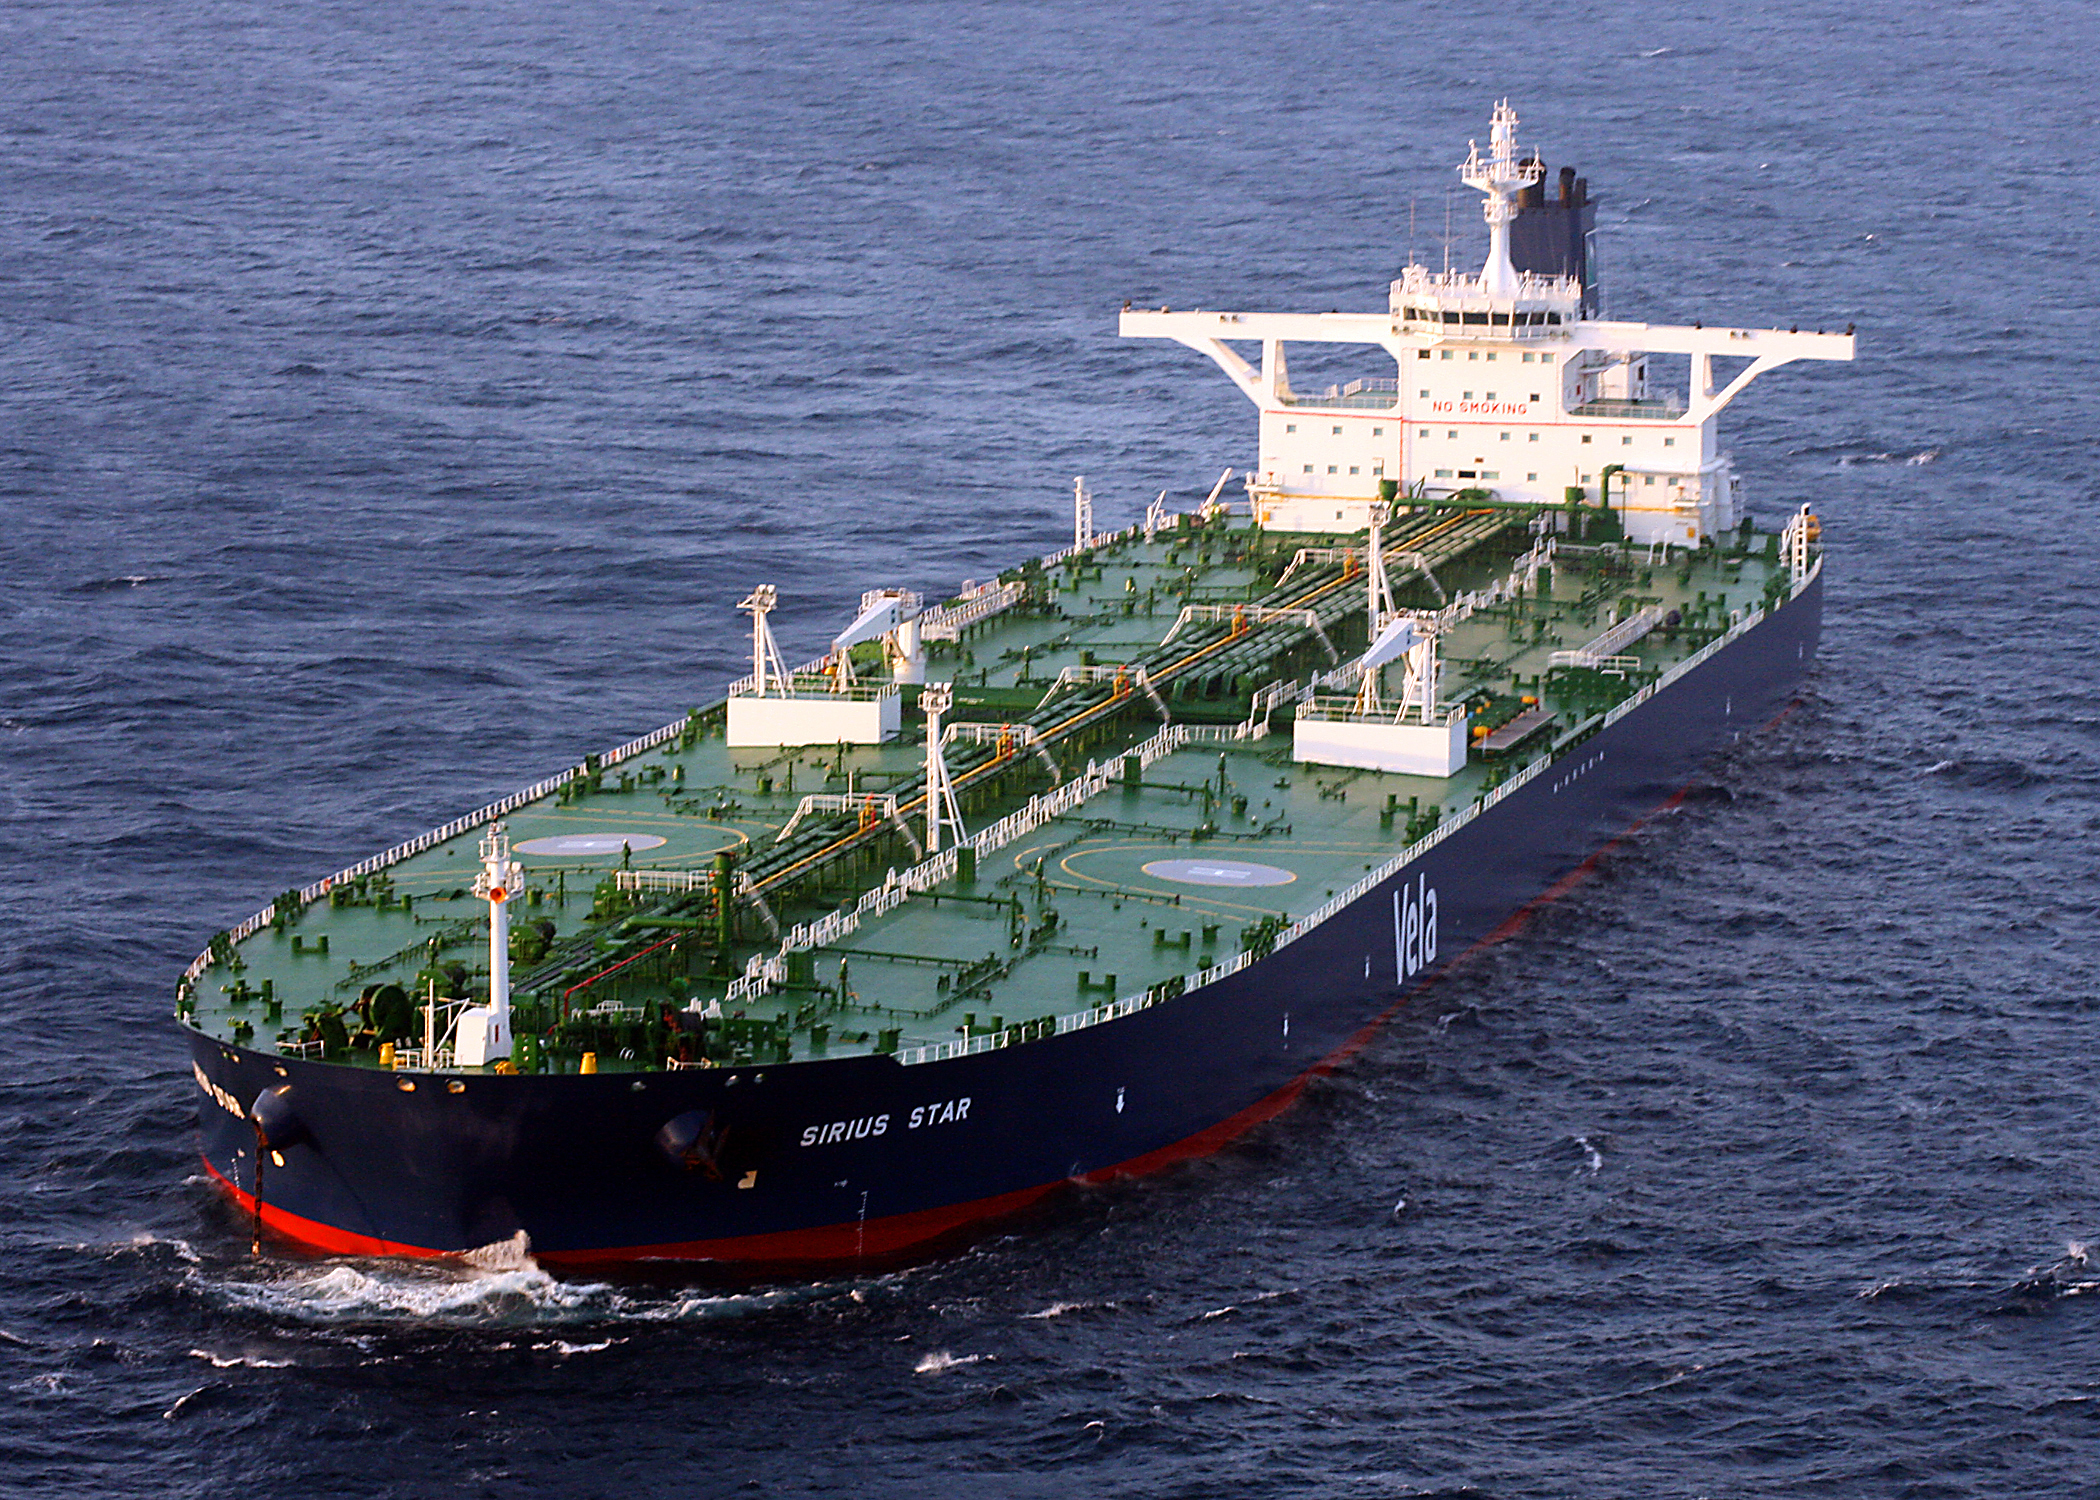 Oil tanker costs surge - Business Insider